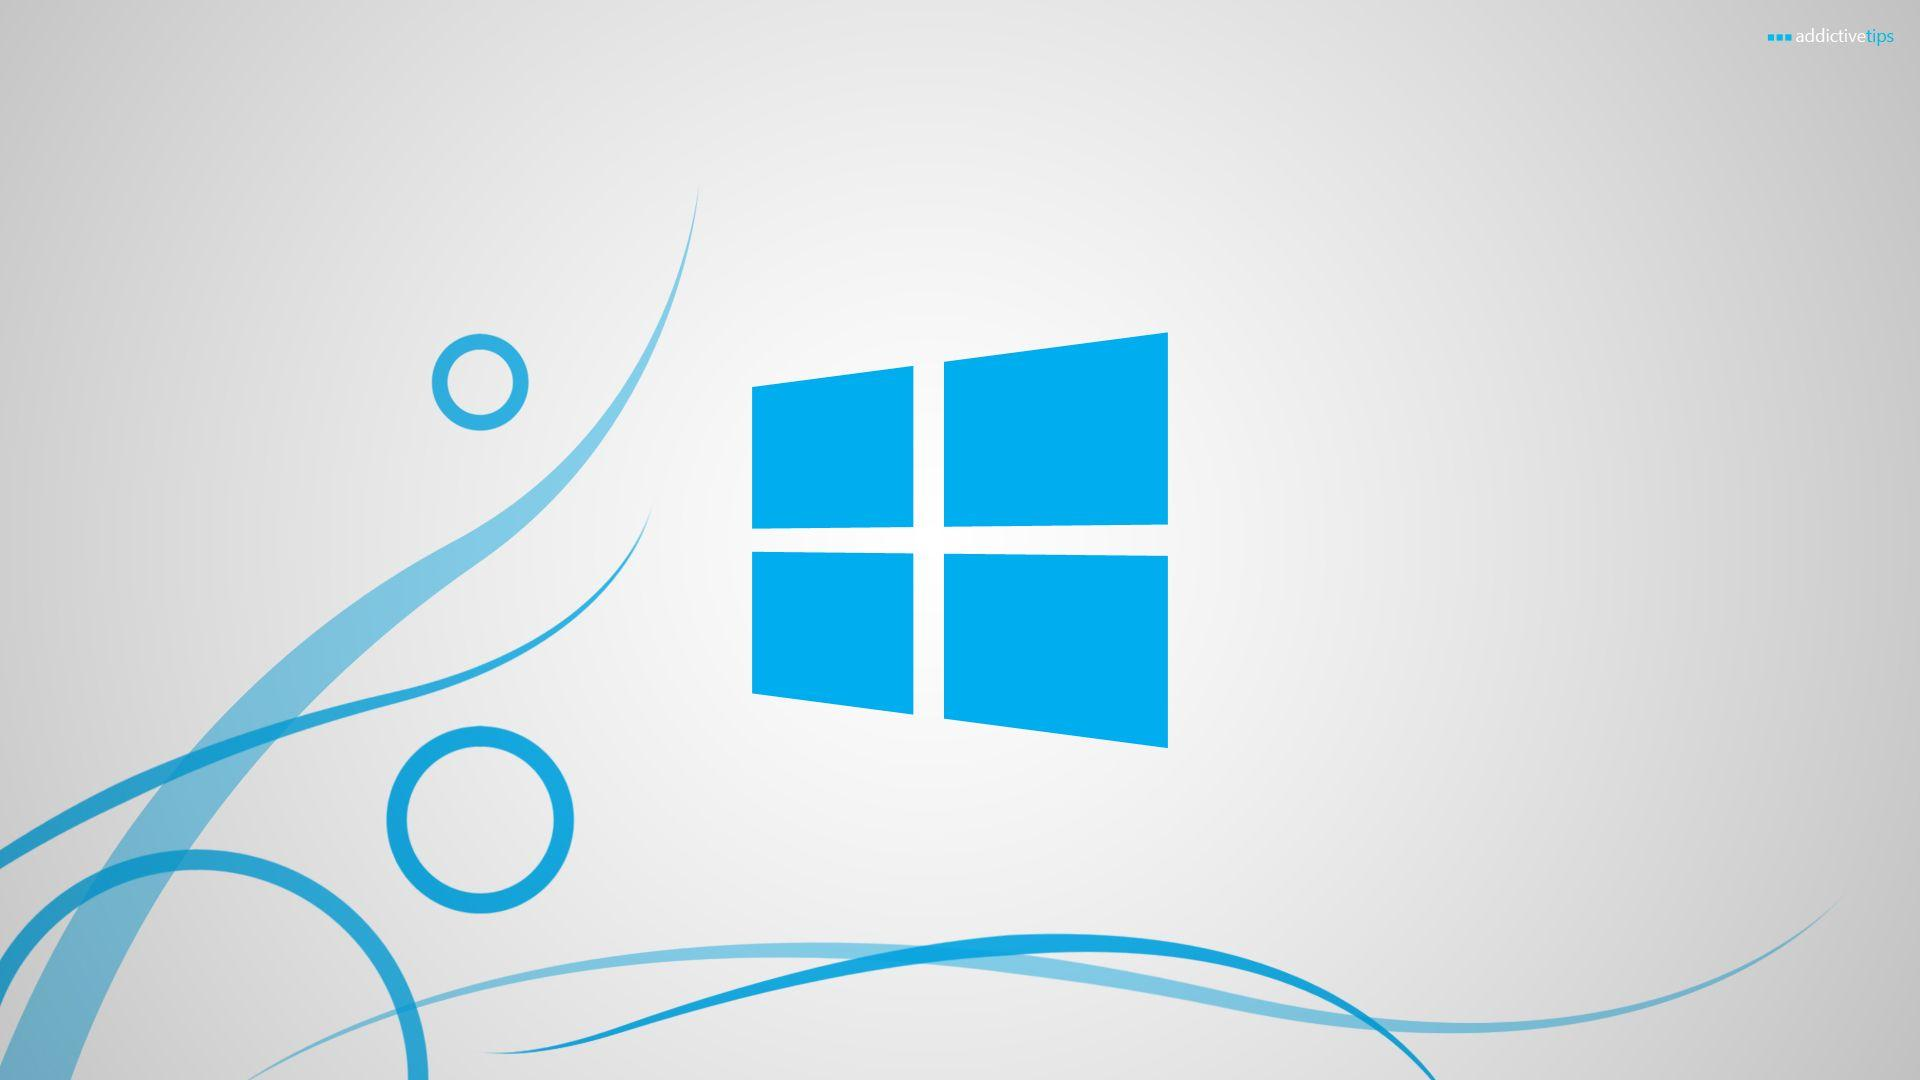 Windows 8 Hd Wallpapers 1920x1080 Wallpaper Cave